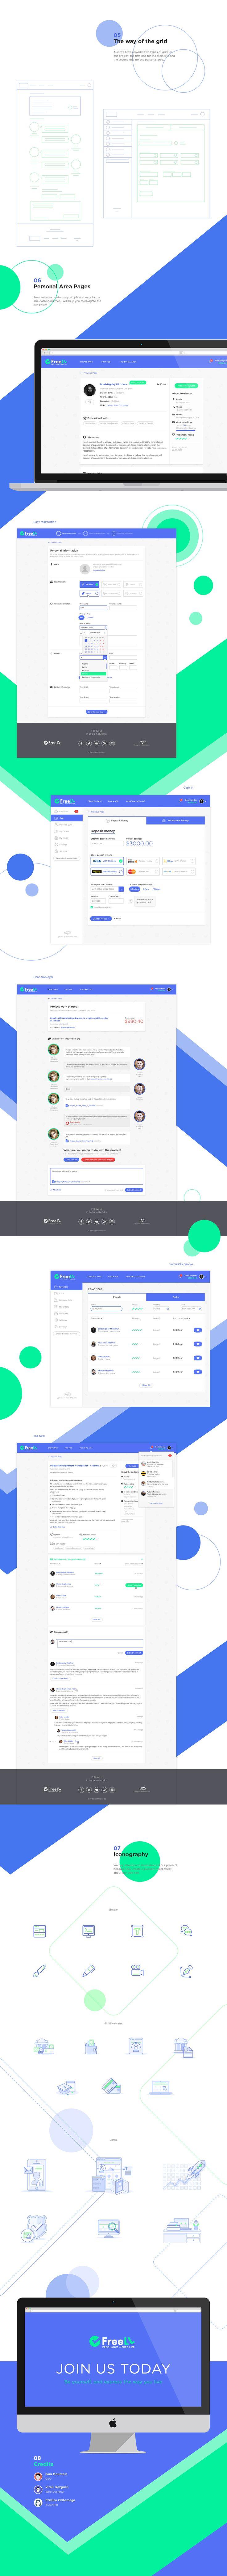 Freell - freelance website on Behance